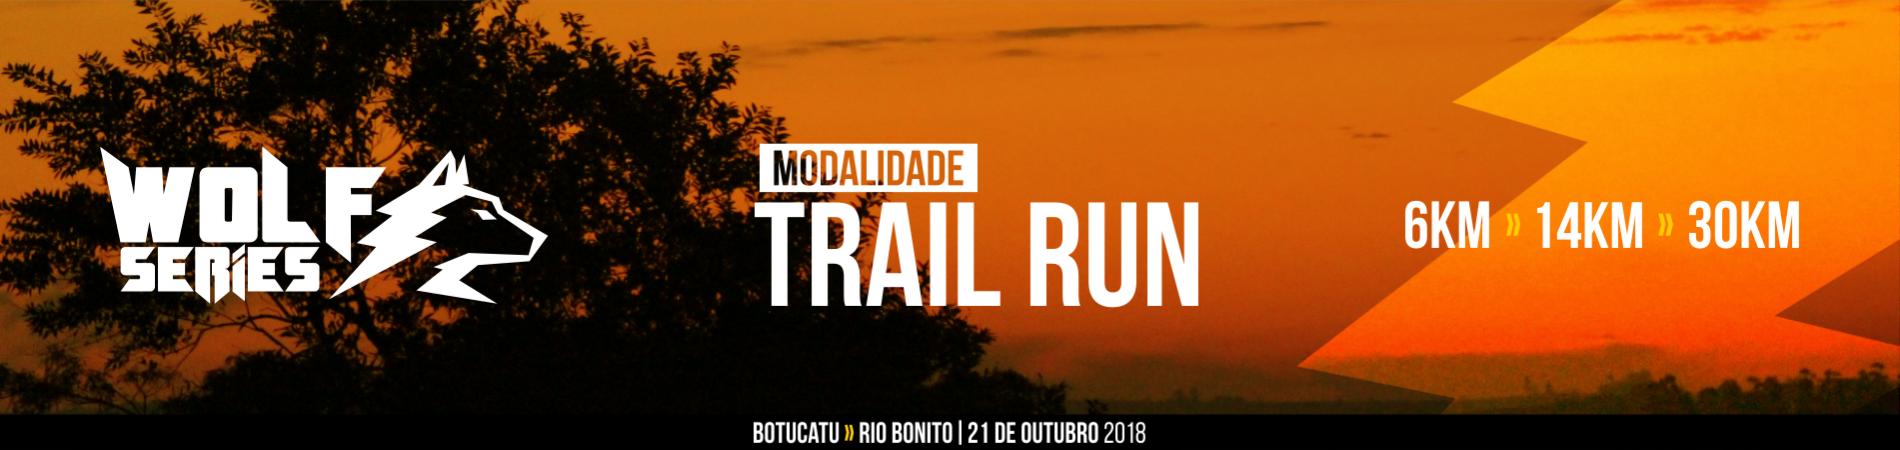 4ª WOLF SERIES - Trail Run - Imagem de topo